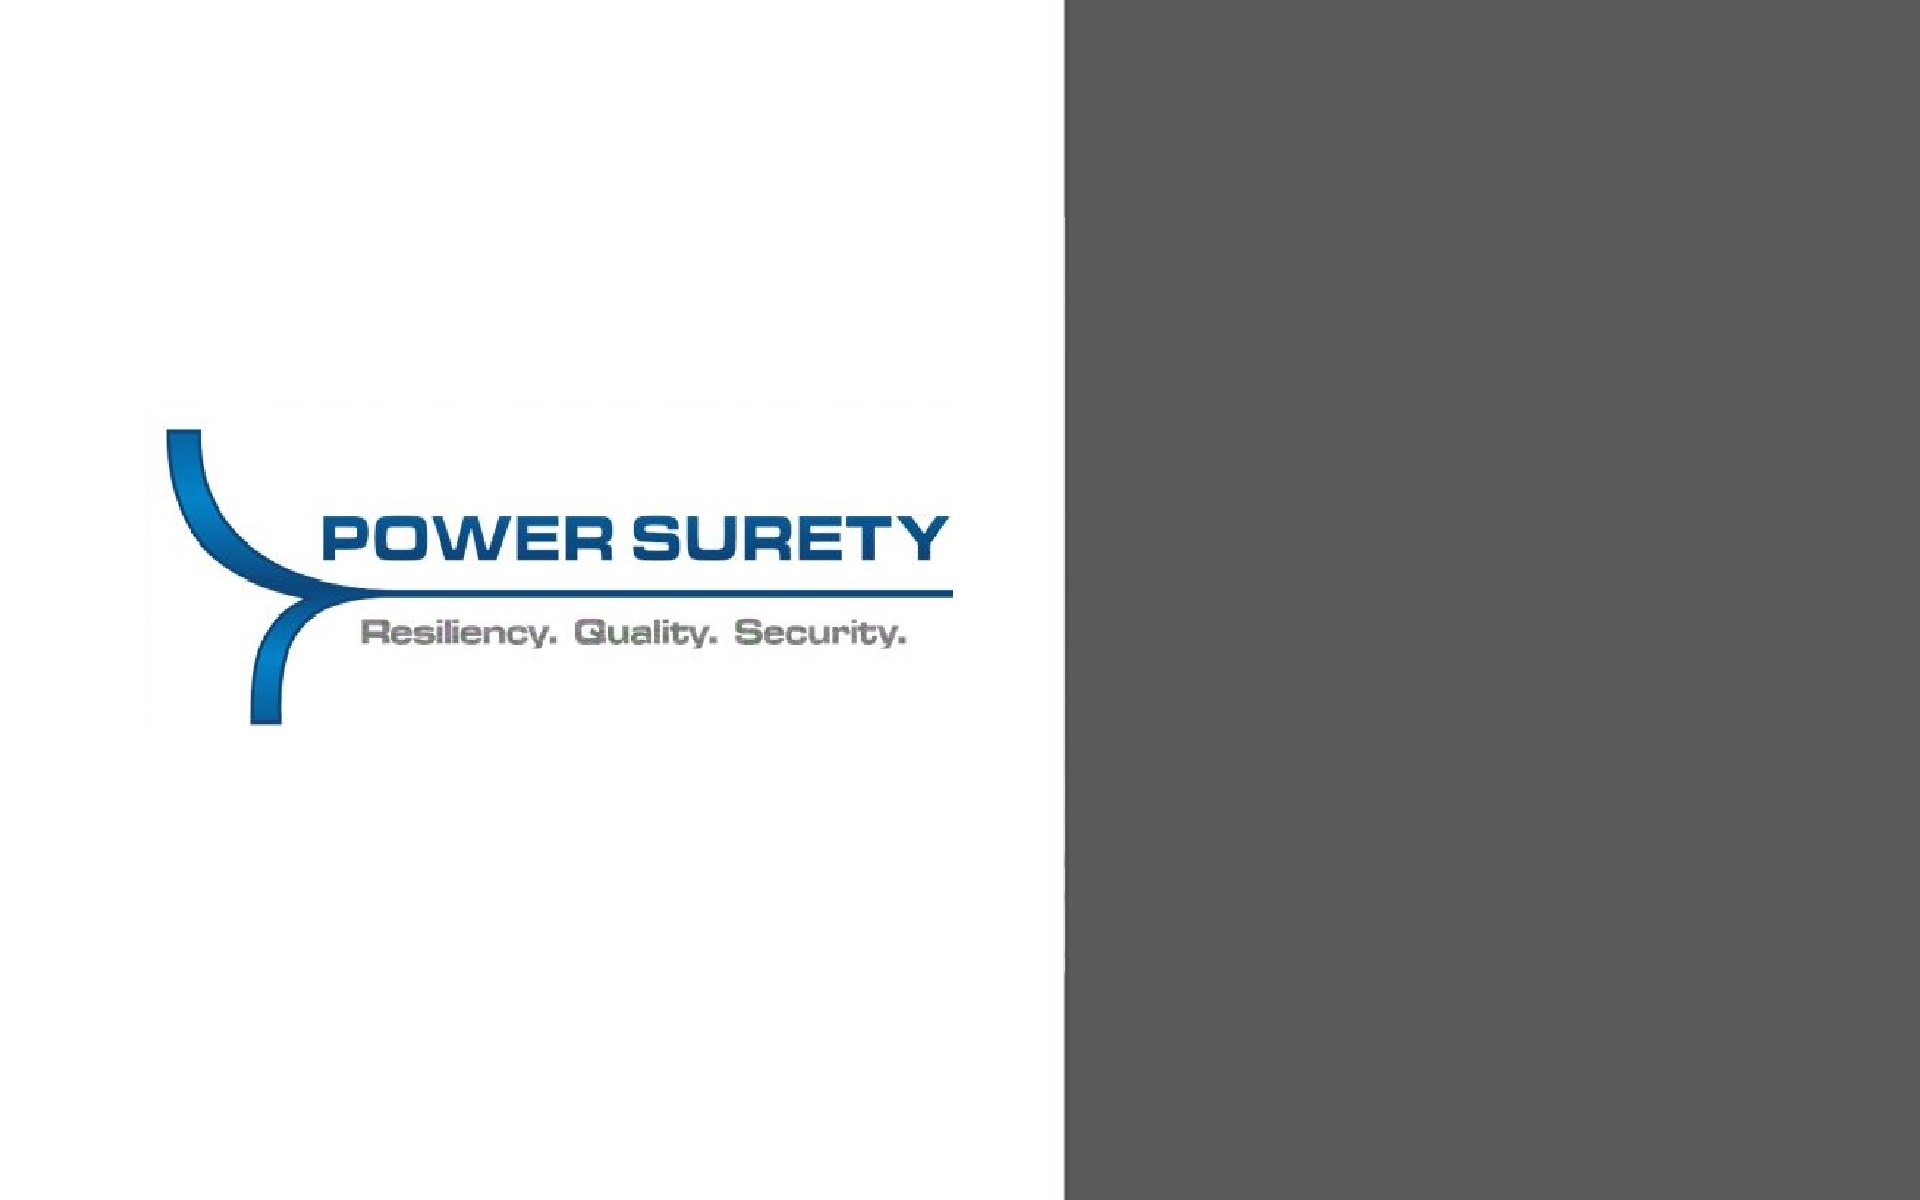 PowerSurety convergence of energy surety power quality energy services